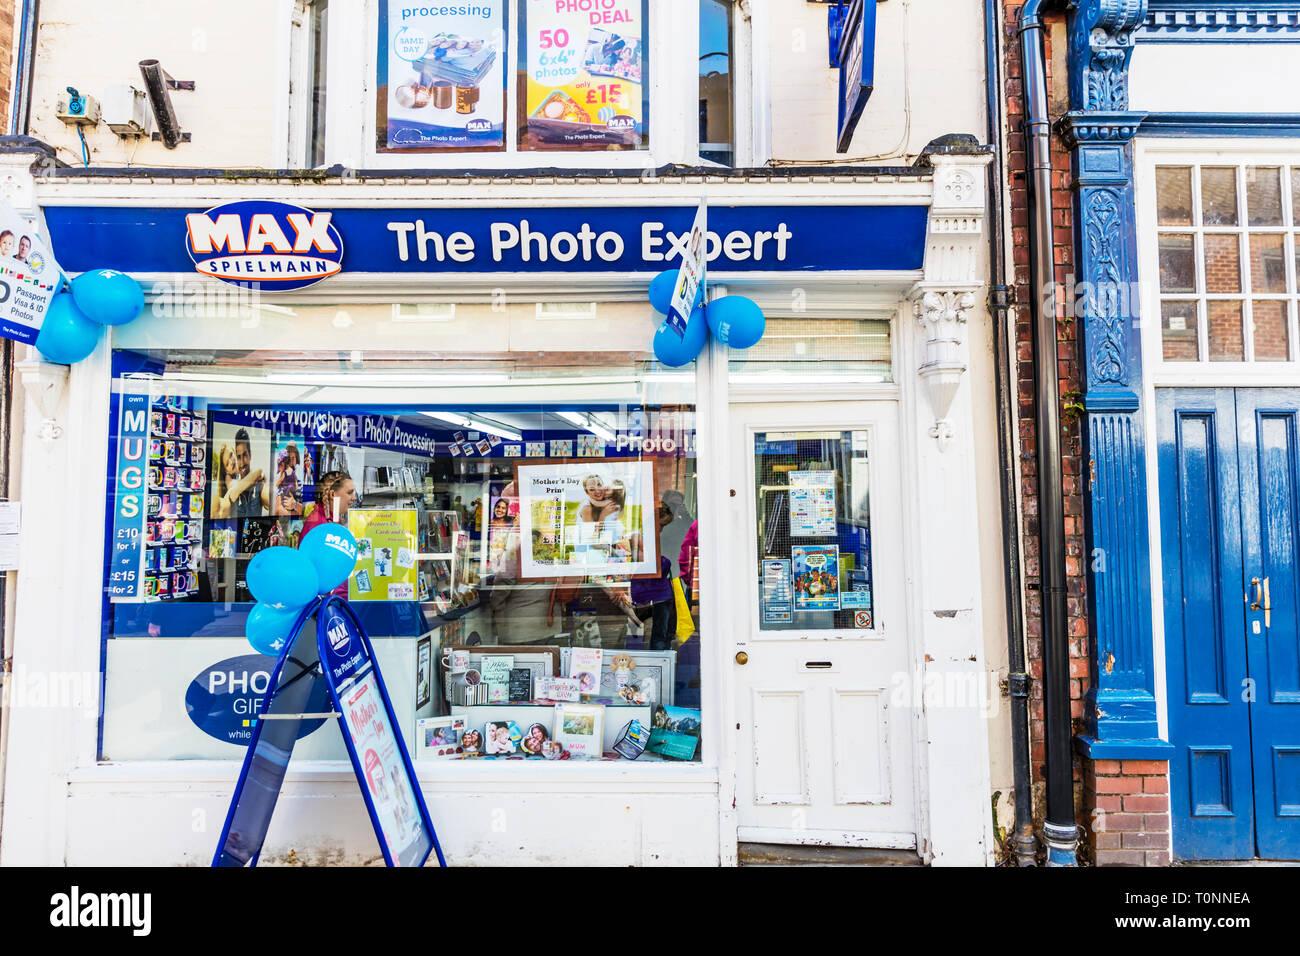 Max Spielmann,  max spielmann Shop, Max Spielmann store, Photo shop, Photo processing, Max Spielmann high street store, Max Spielmanns, UK, shop, sign Stock Photo